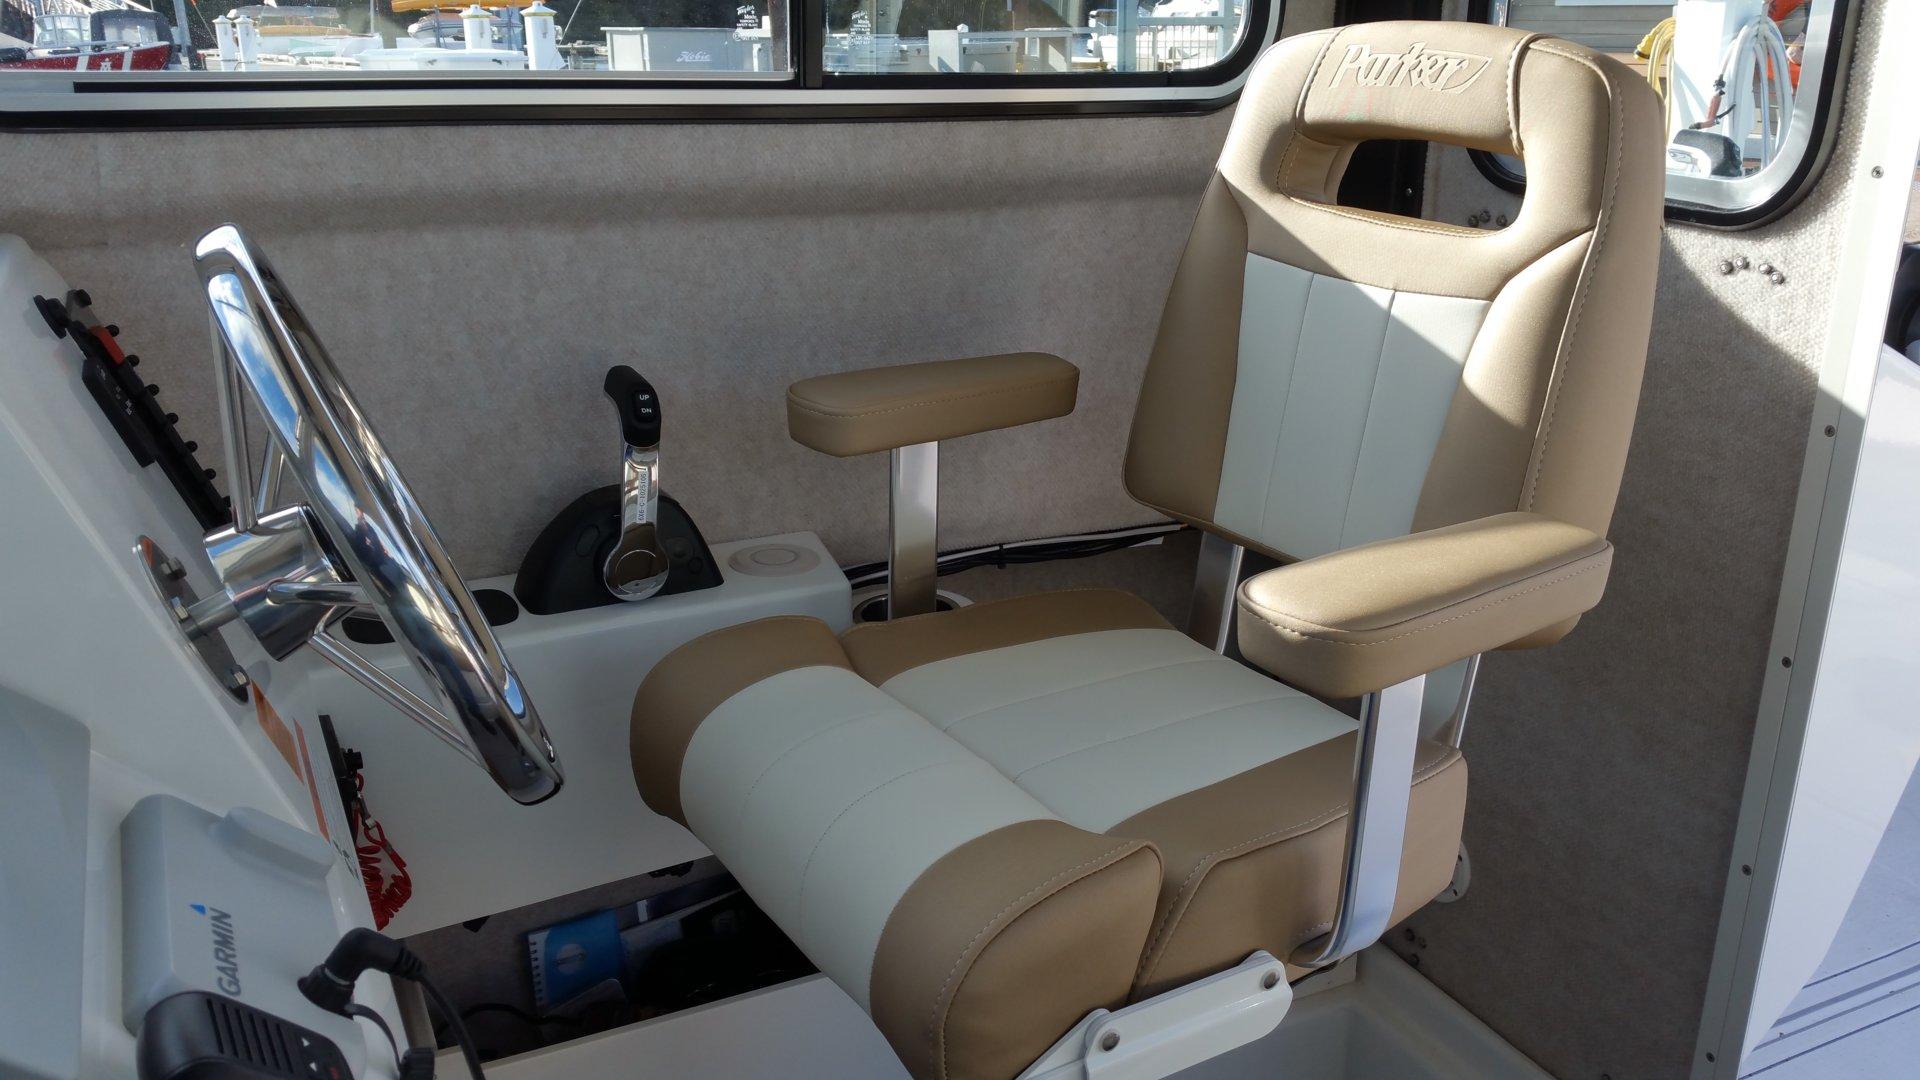 demo seat 2.jpg